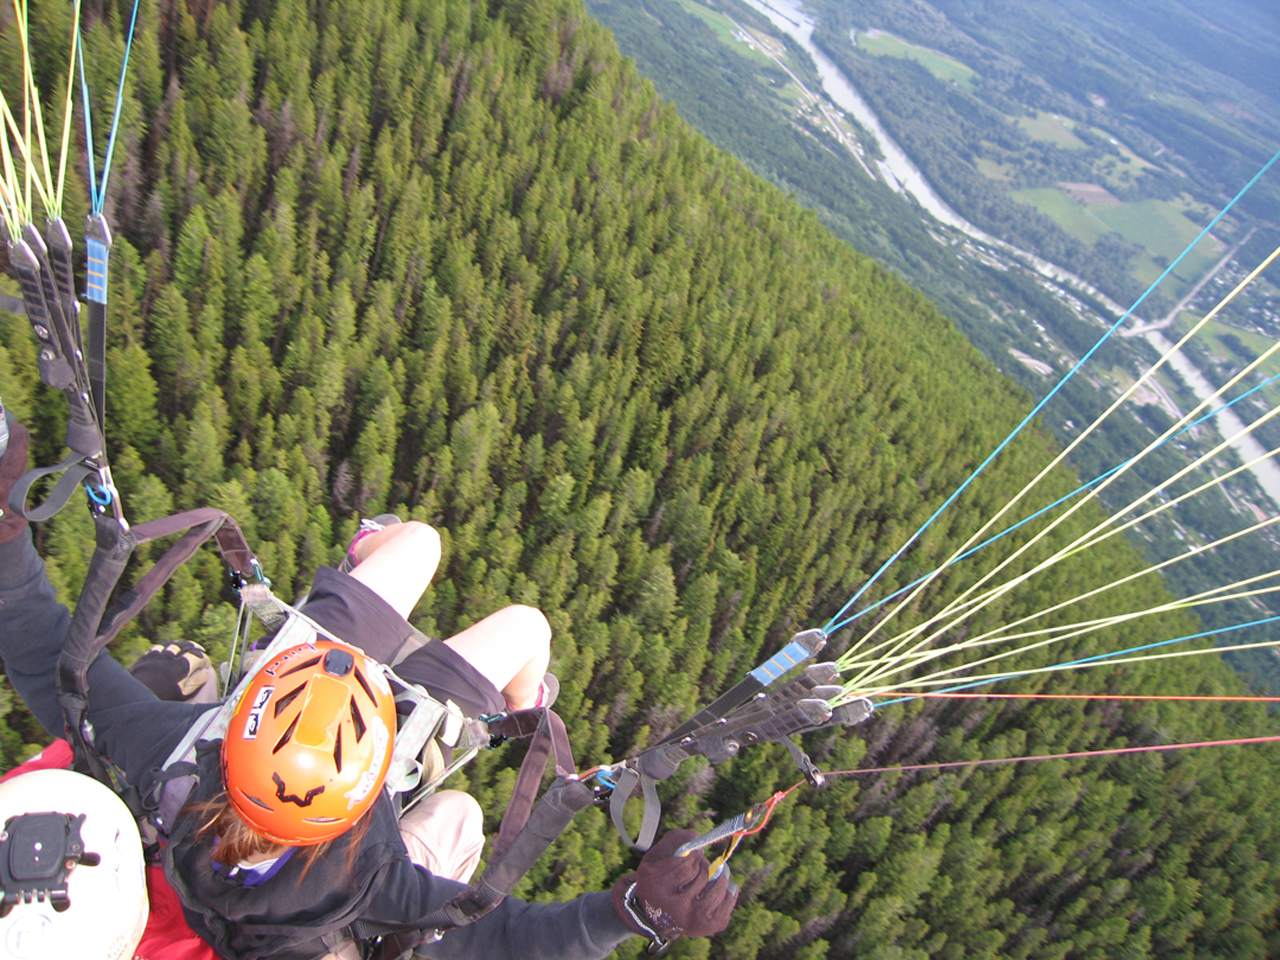 Girl paragliding in Golden, British Columbia